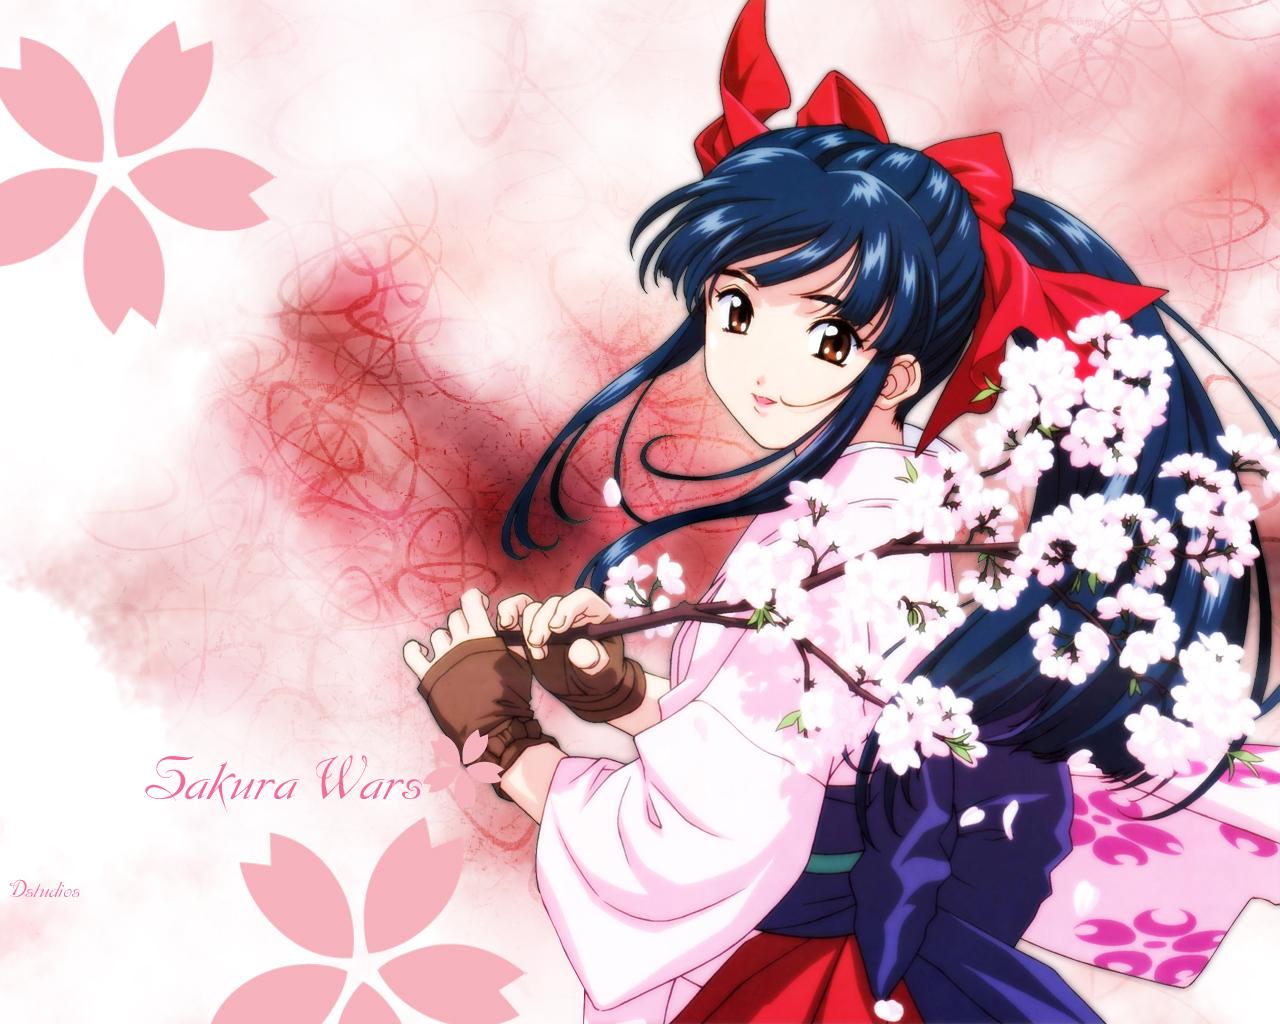 Sakura Wars Bishi Topics Anime Wallpapers